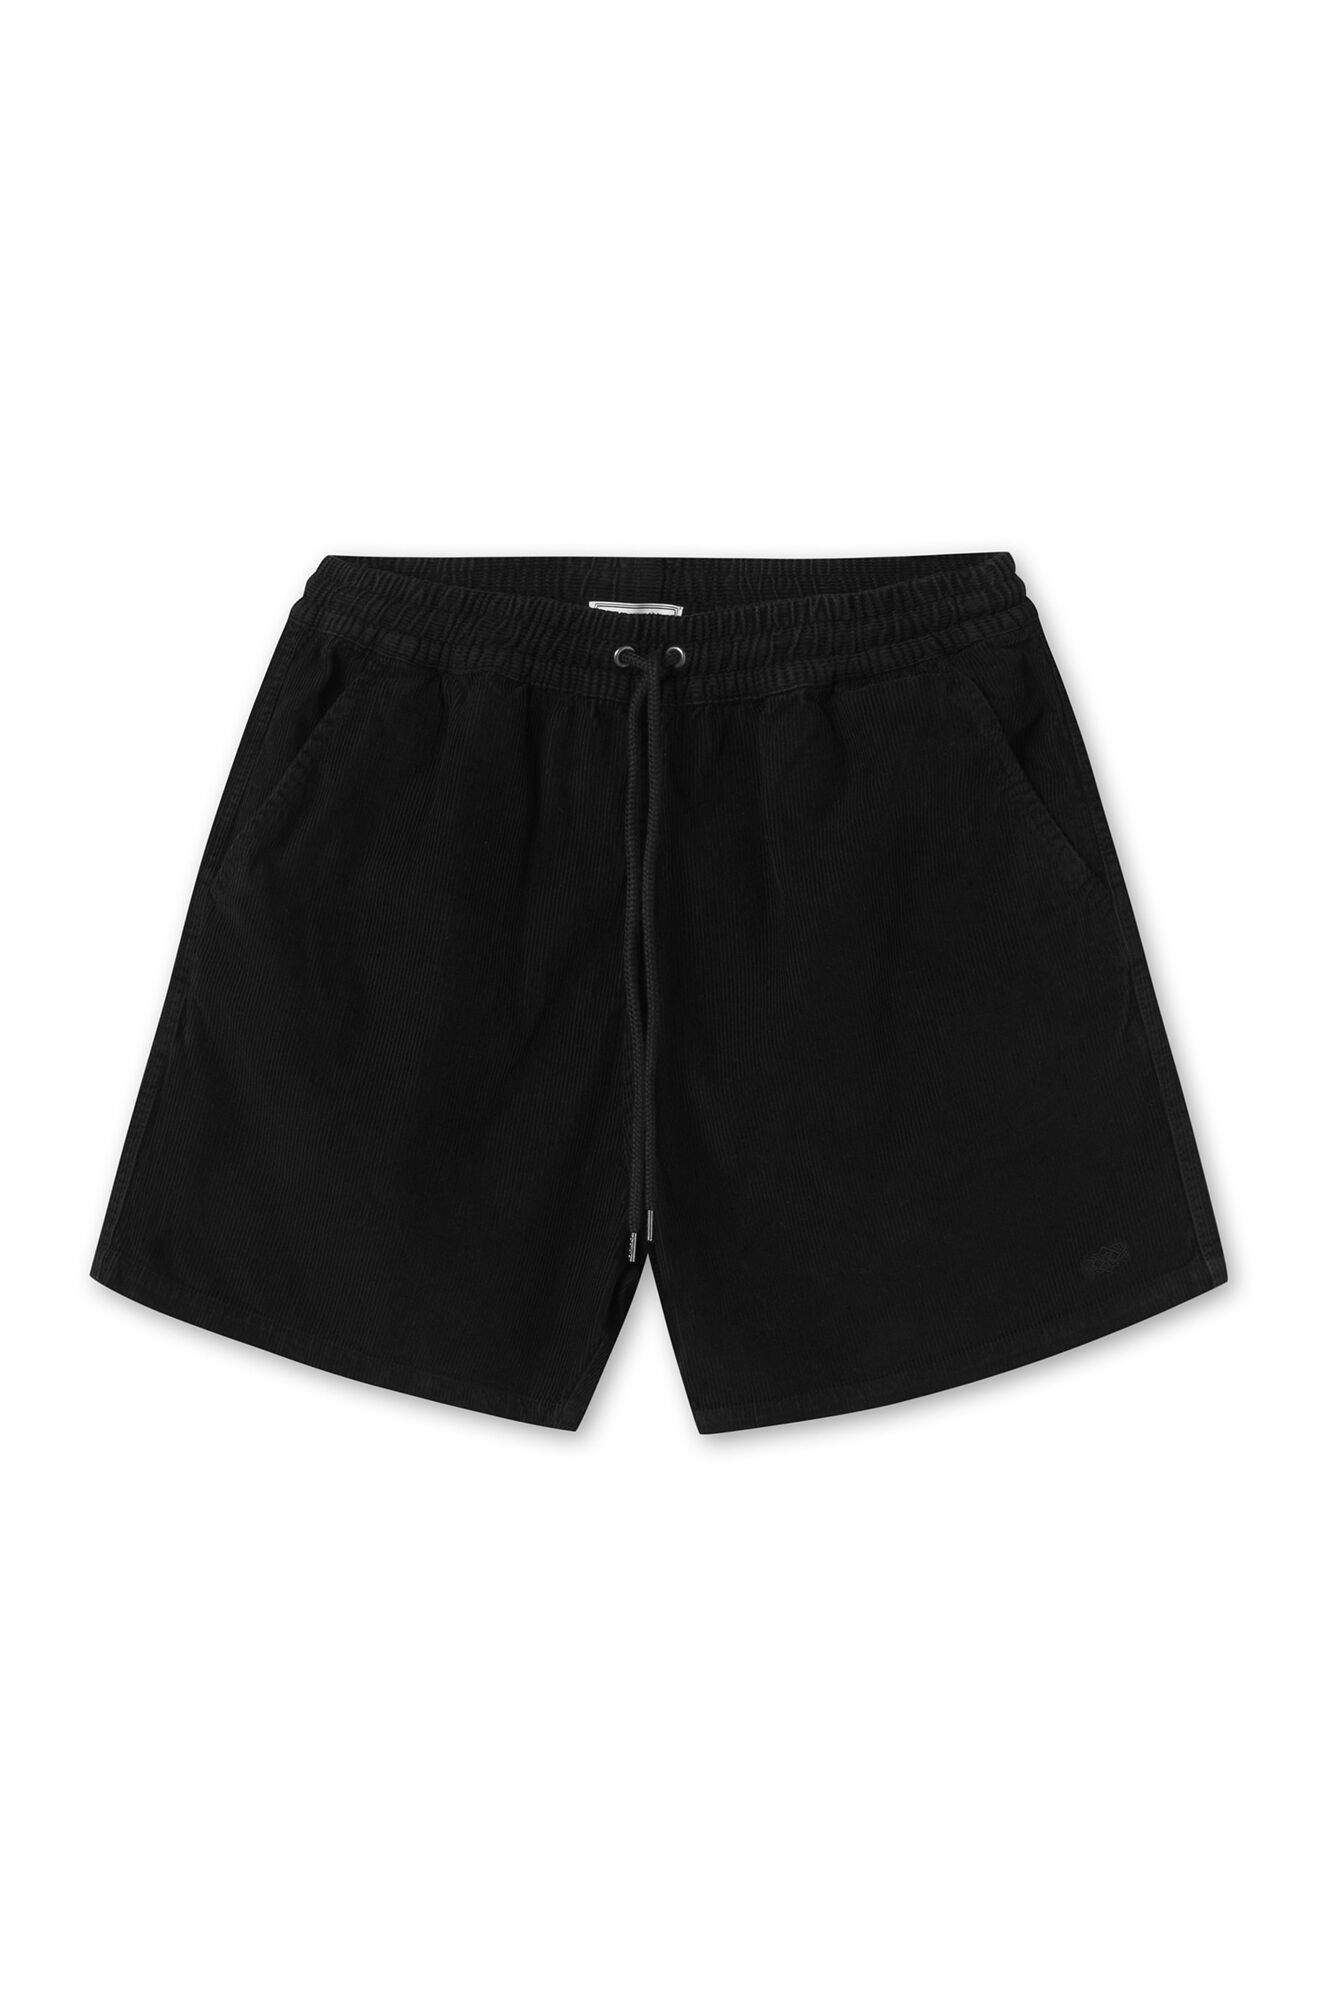 Rove Shorts 460